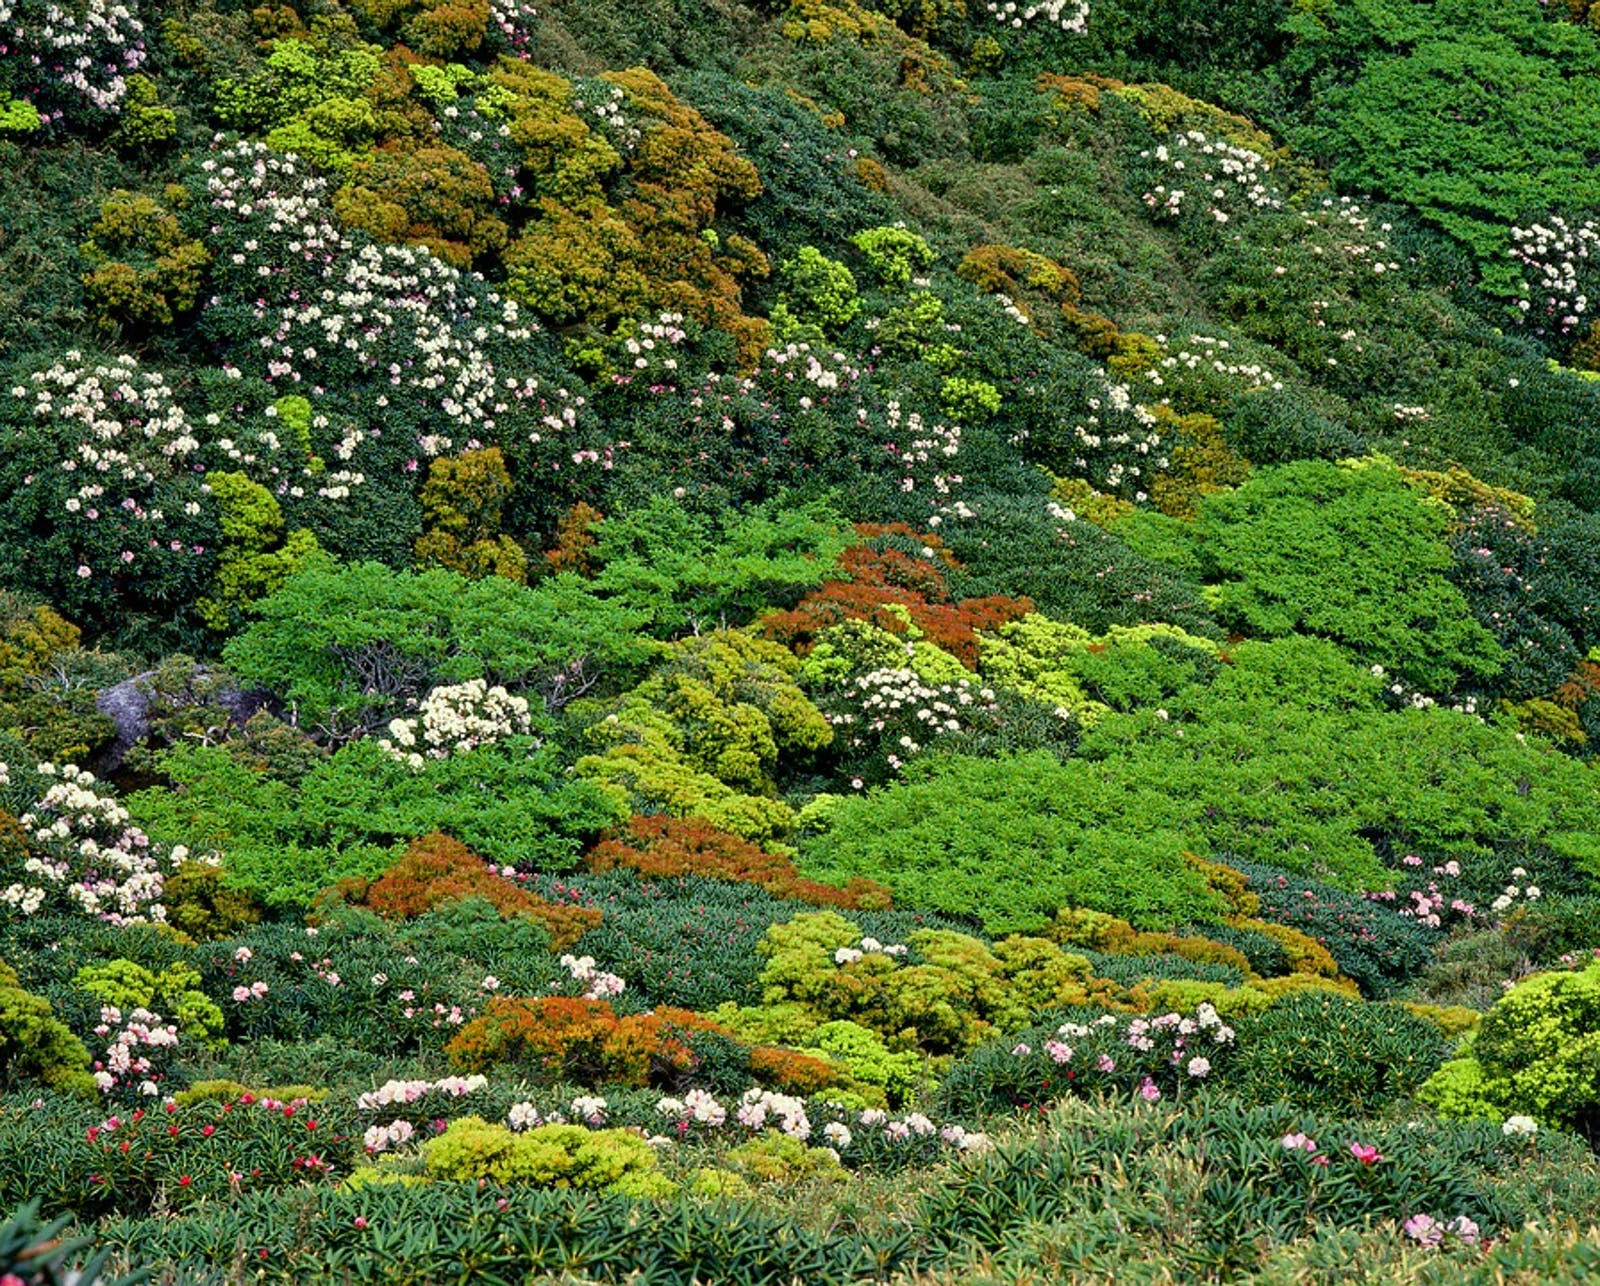 Nansei Islands Subtropical Evergreen Forests